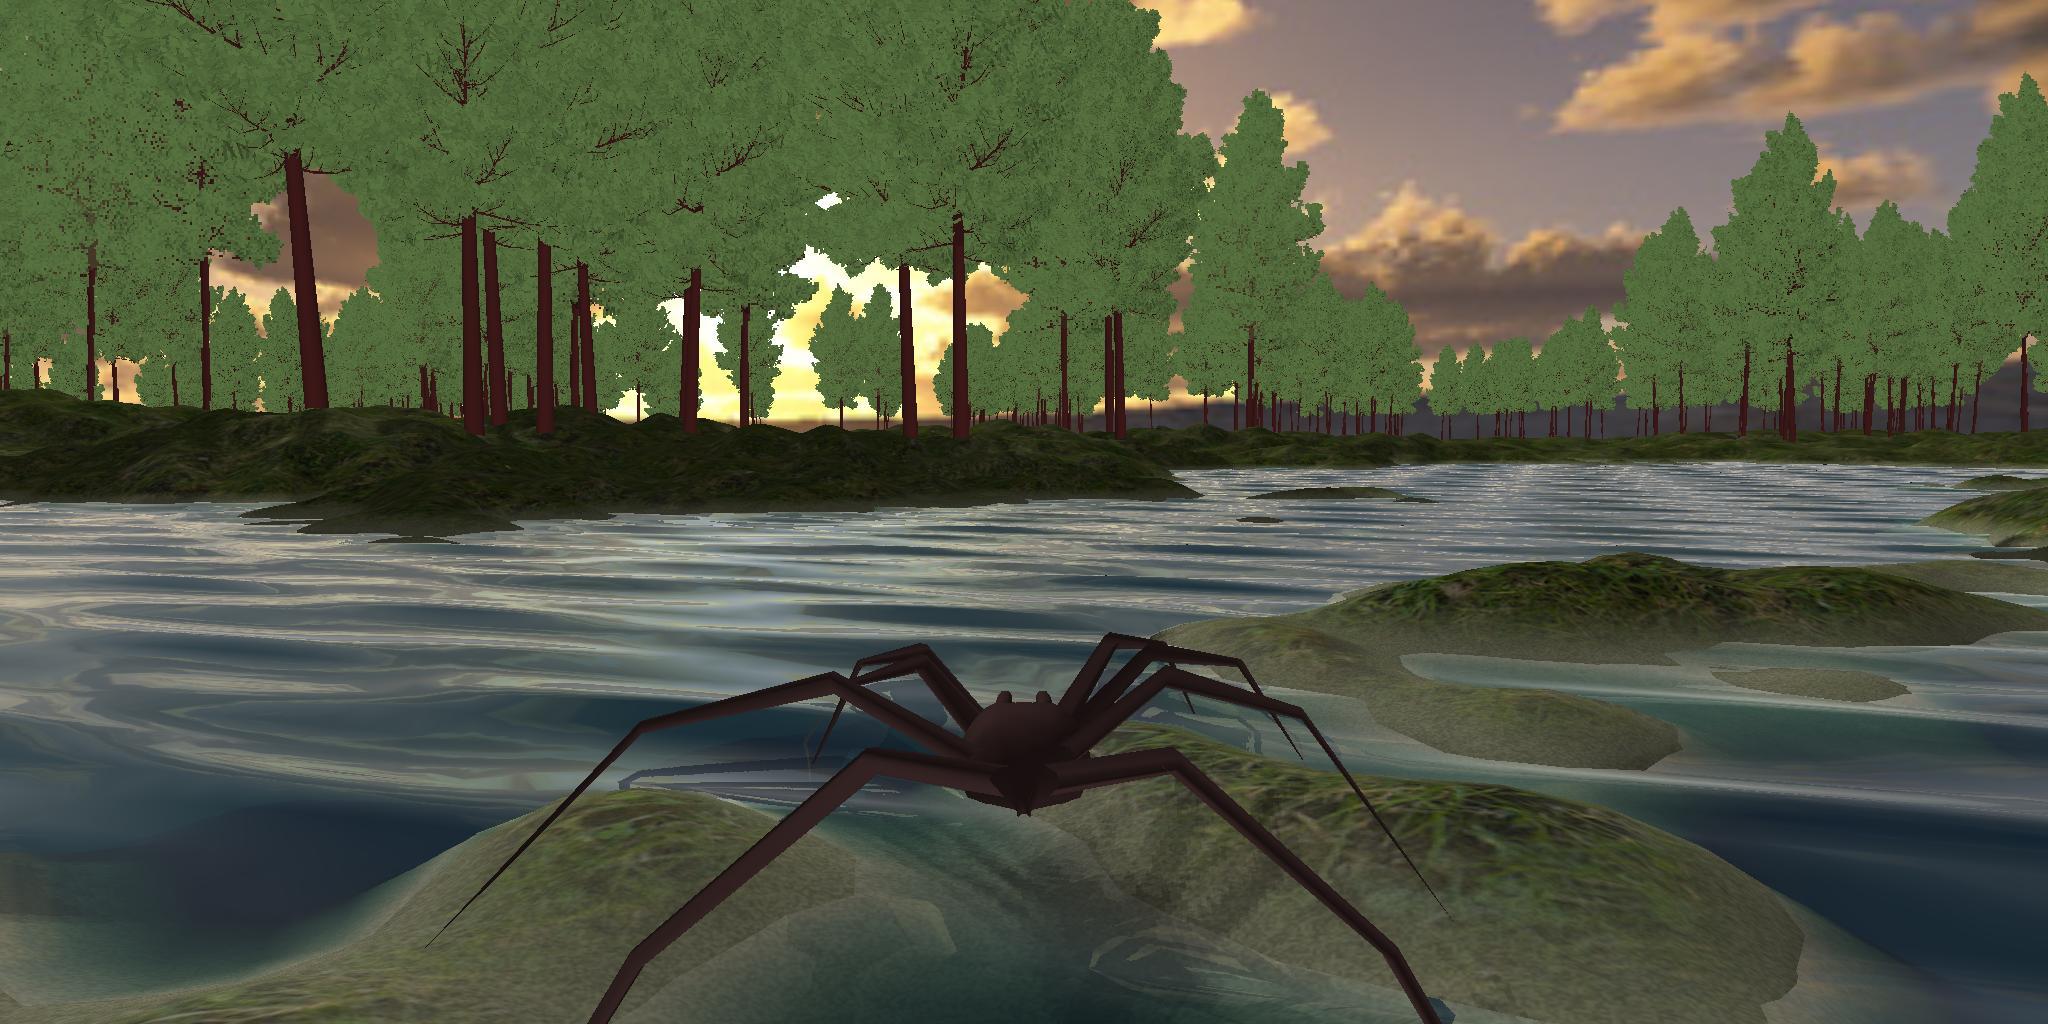 Spider example